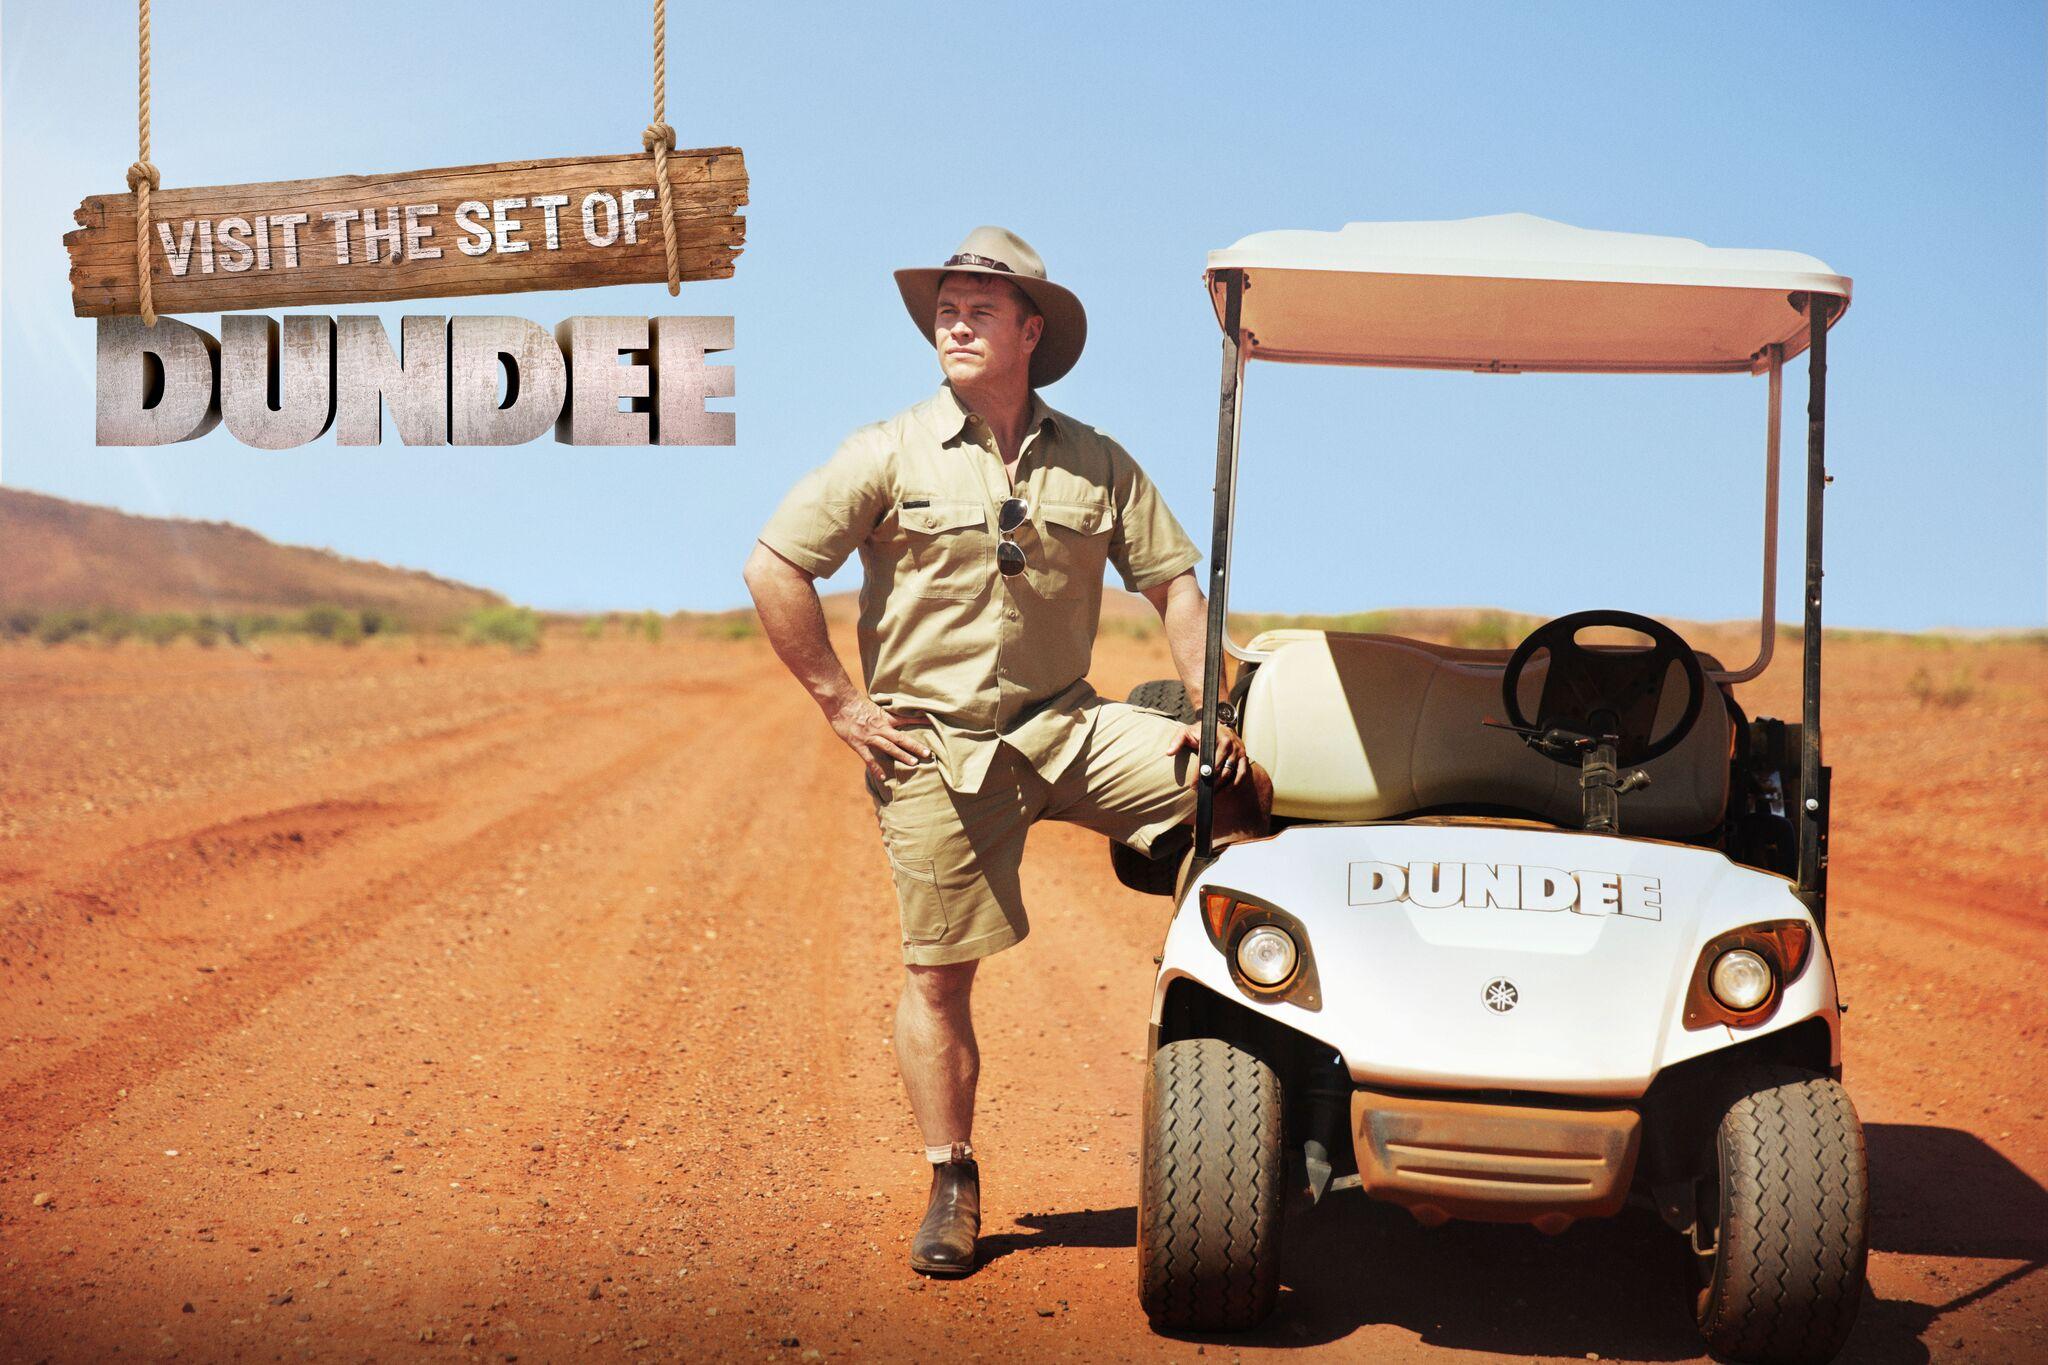 Luke Hemsworth Stars In Next Phase Of Tourism Australia's $36M 'Dundee' Campaign